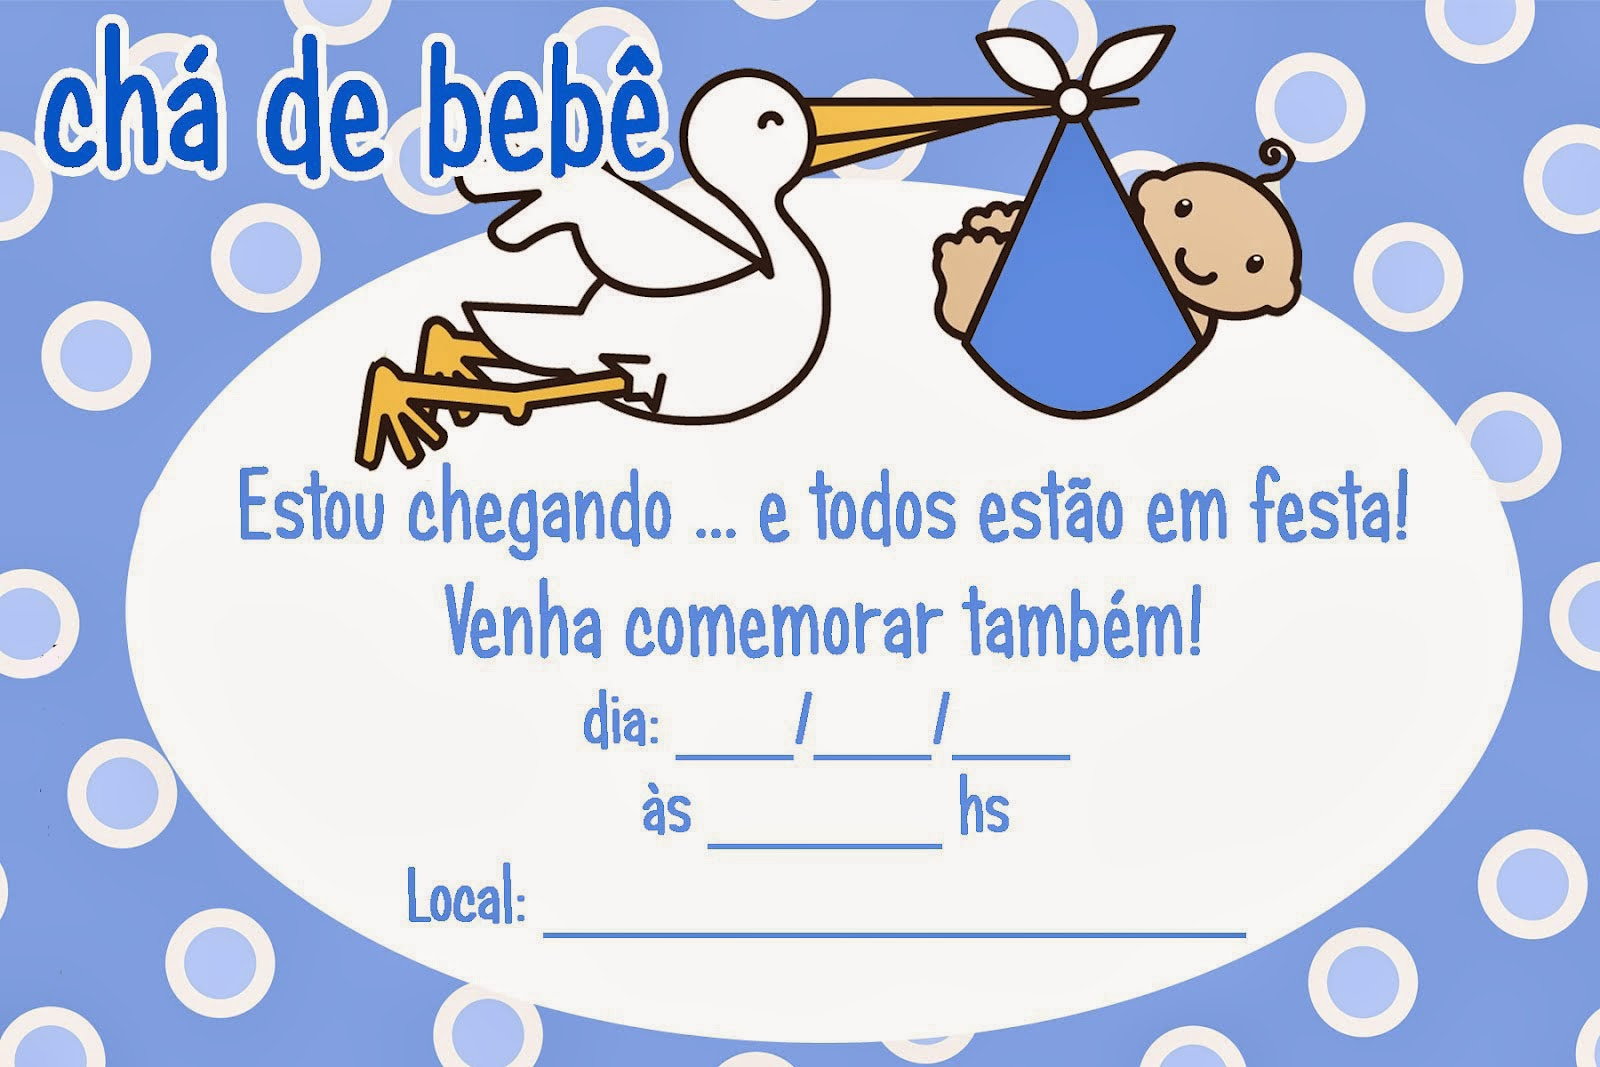 Convite para chá de bebê online 9